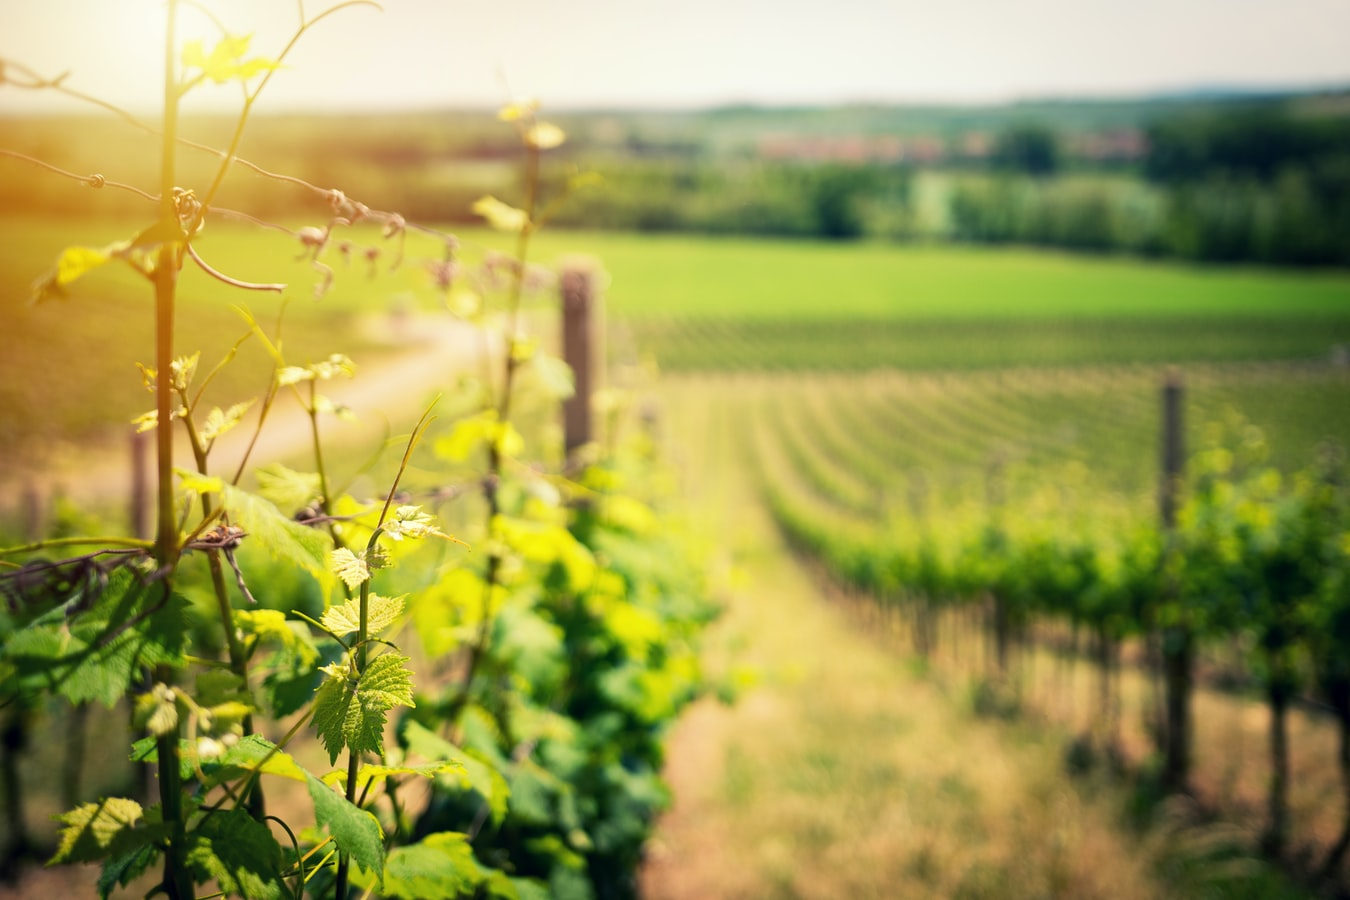 Un champ de vignes.